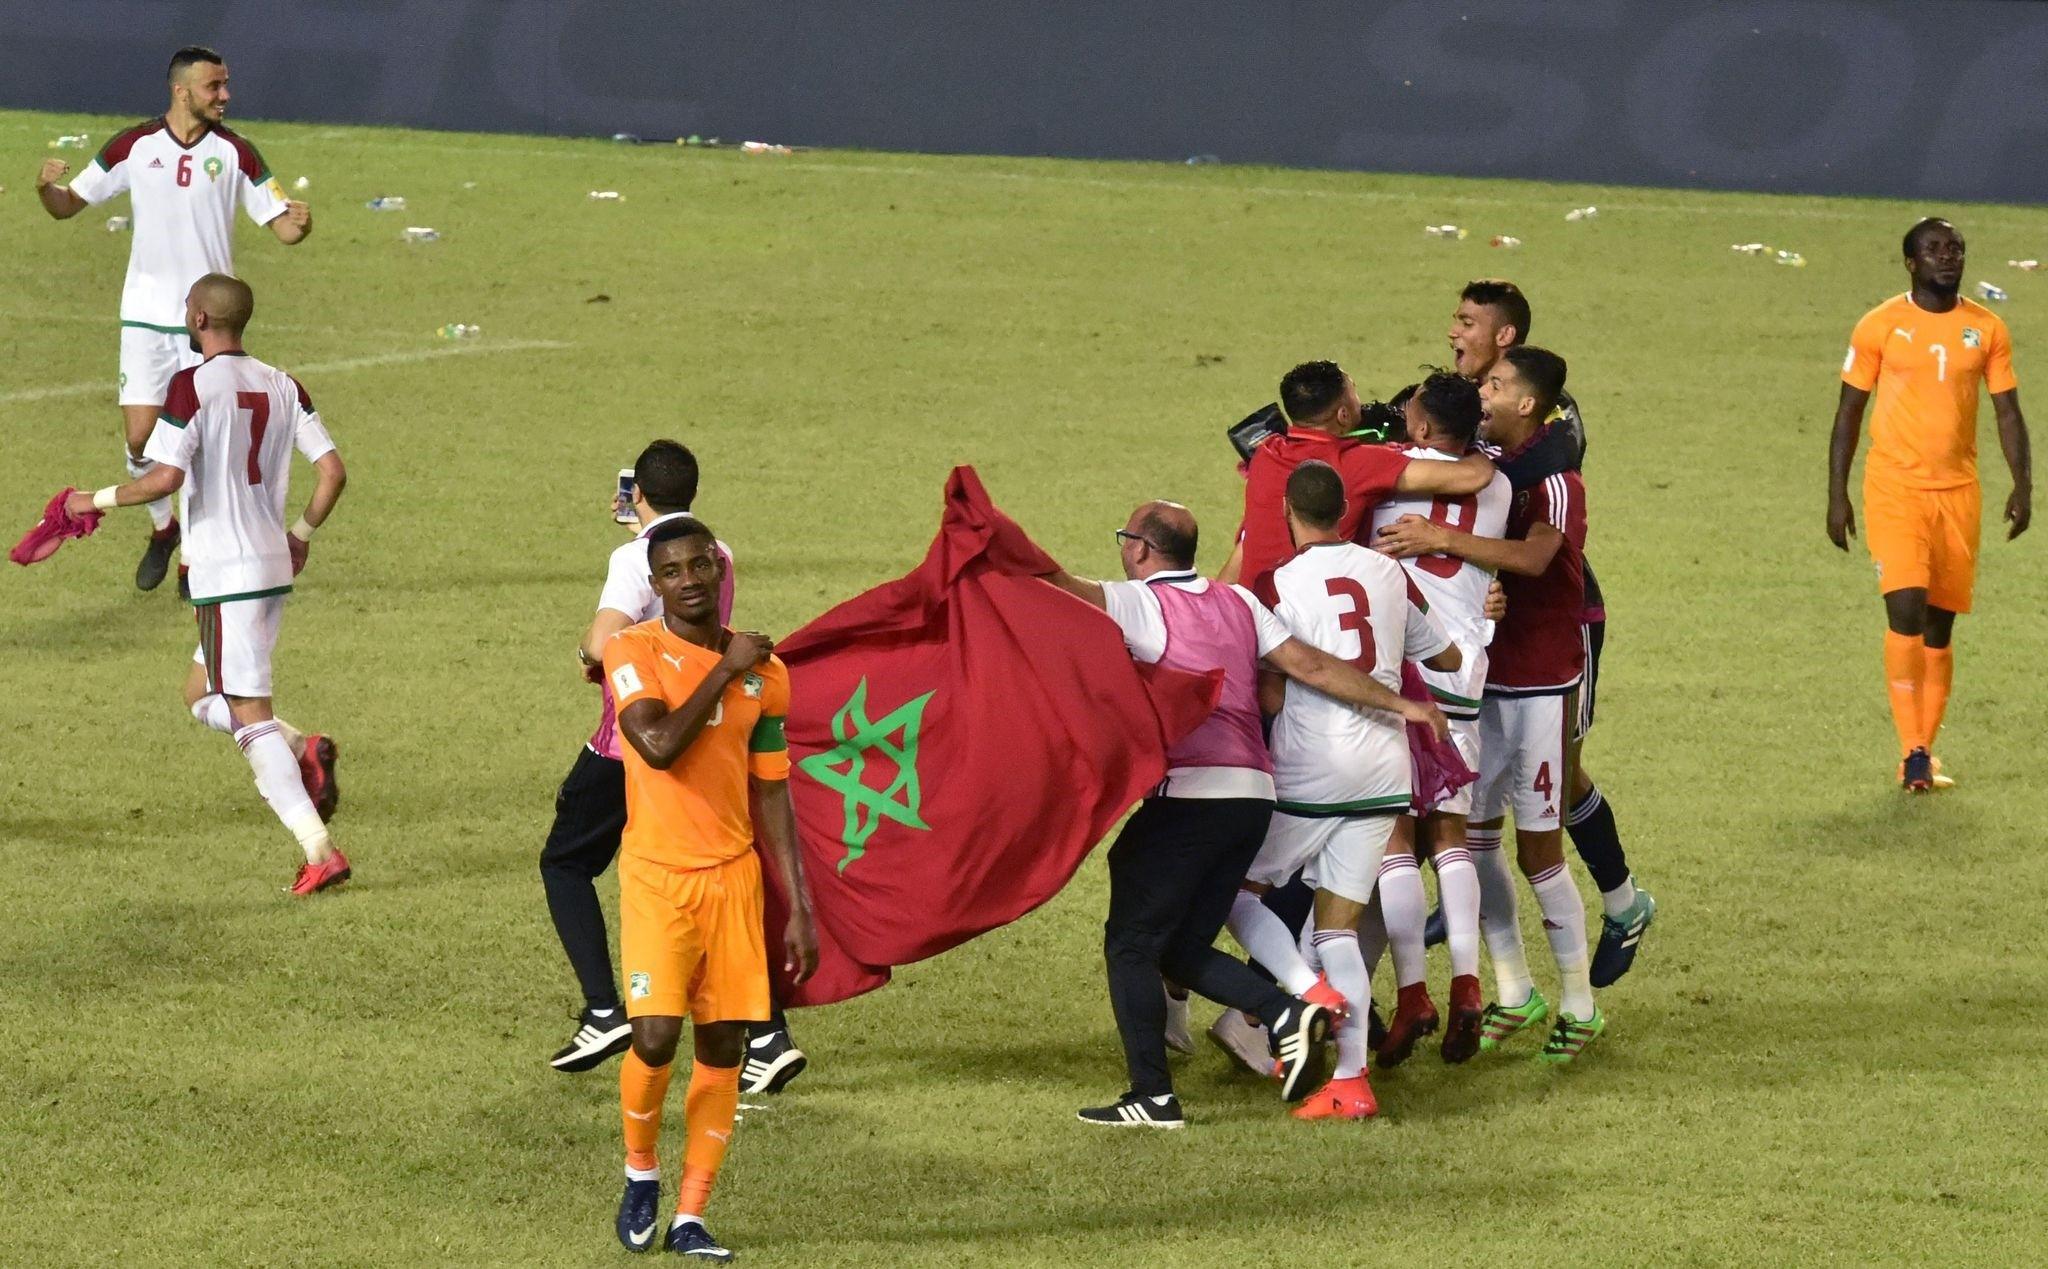 Morocco's players celebrate at the Felix Houphouet-Boigny stadium in Abidjan on November 11, 2017. (AFP Photo)